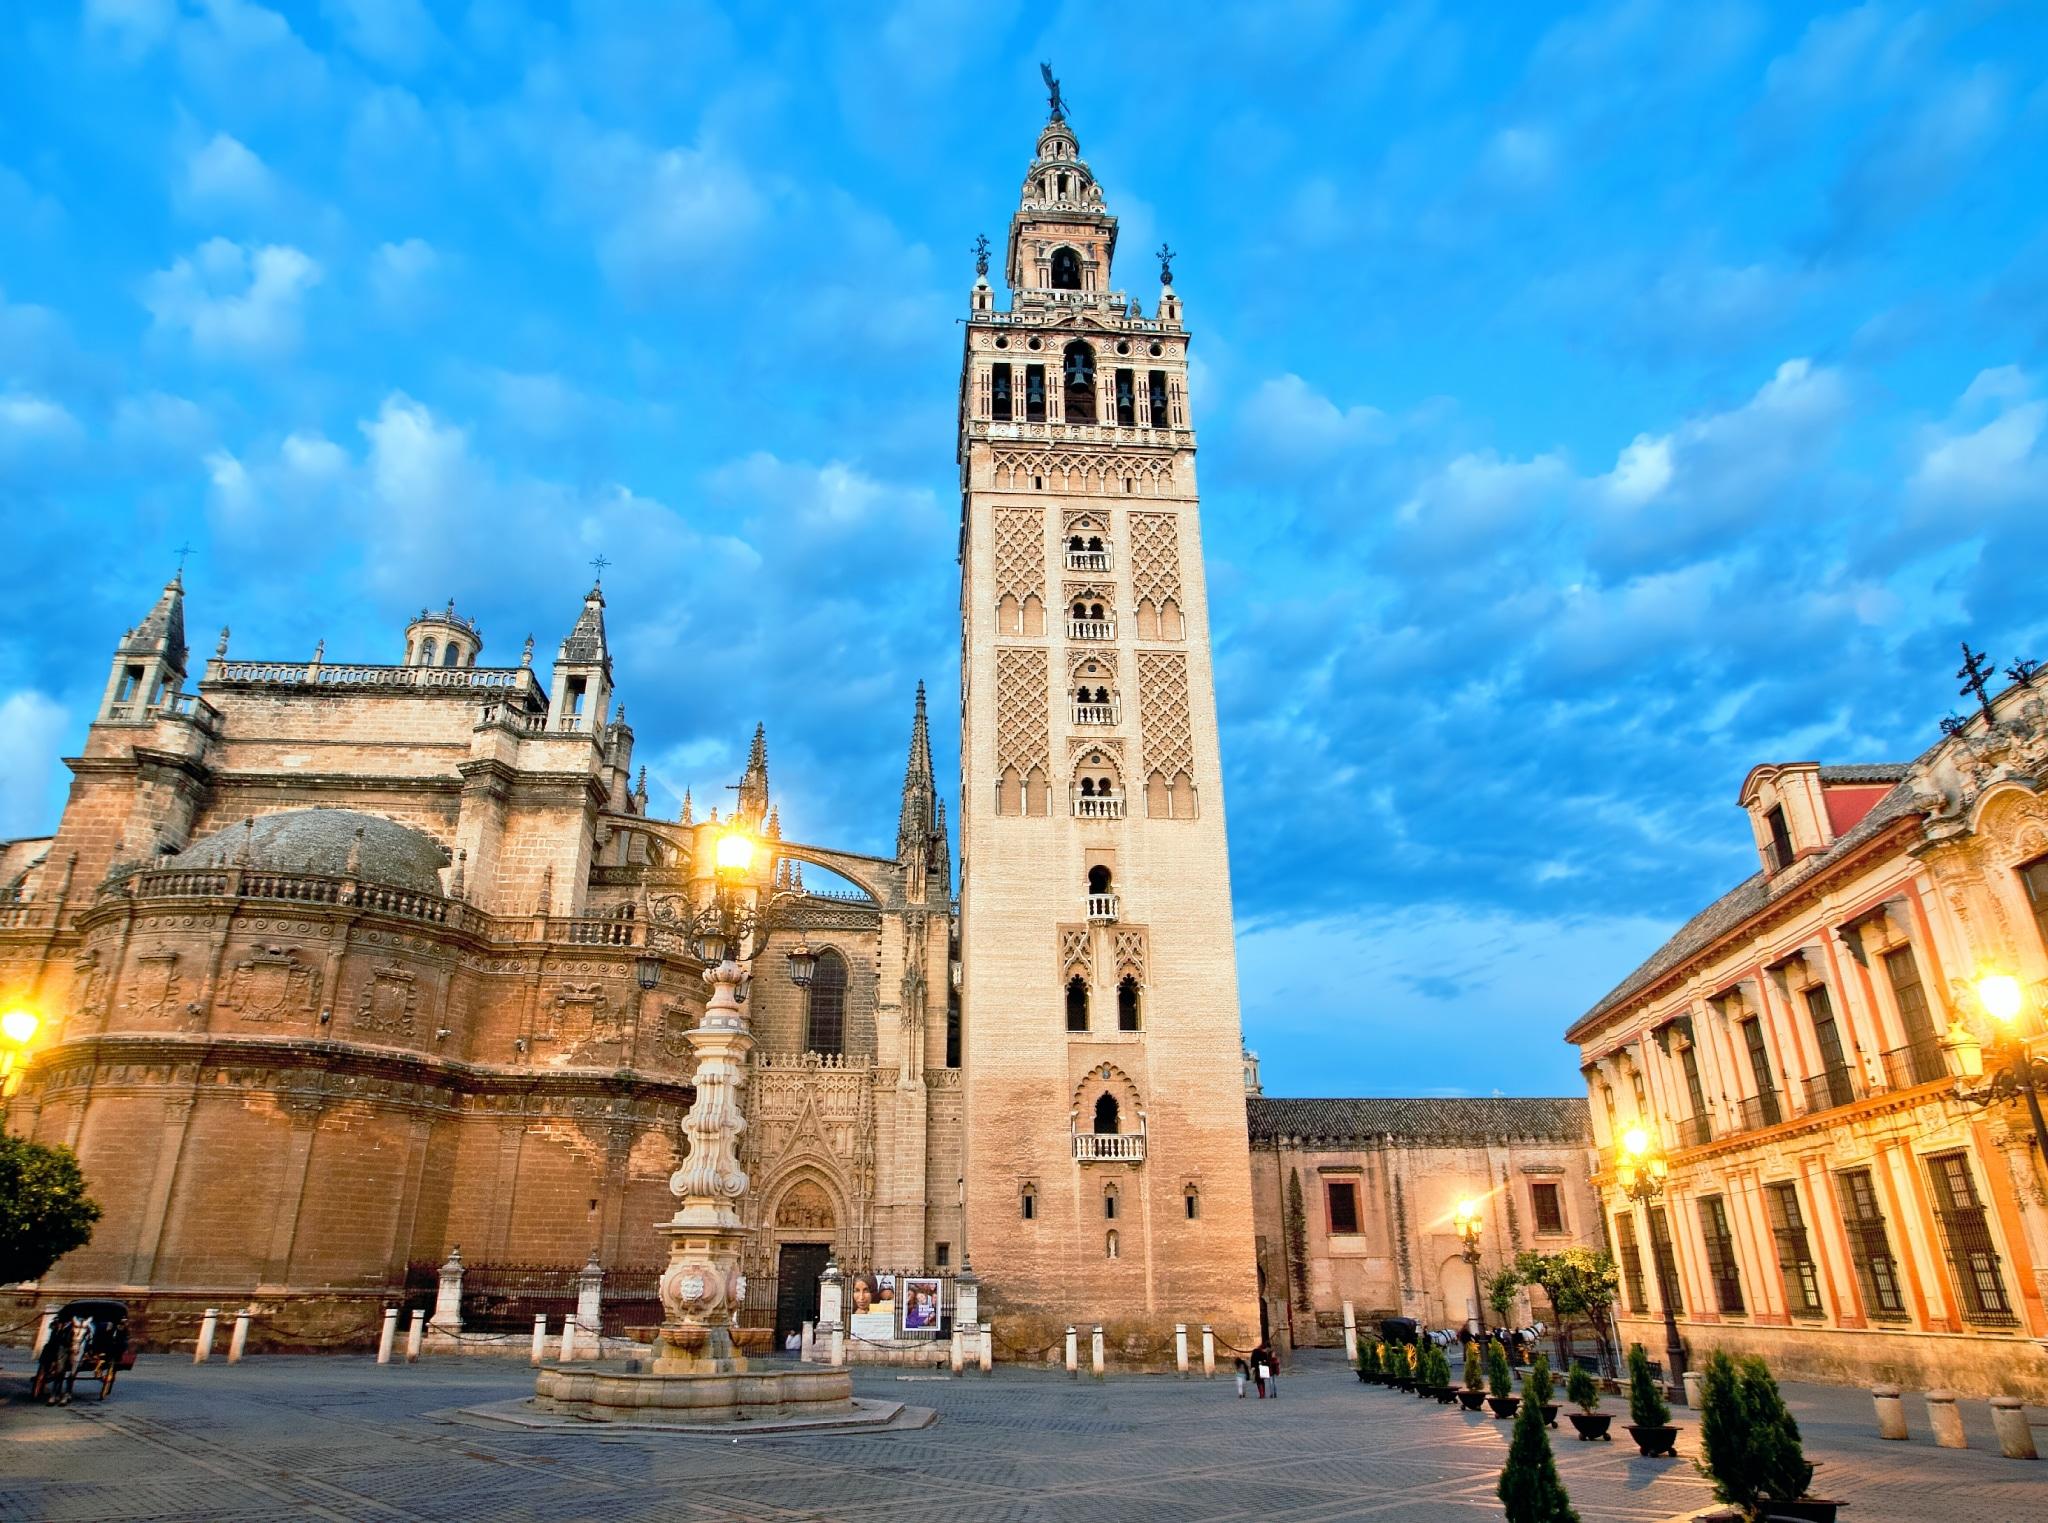 La Giralda de la catedral de Sevilla